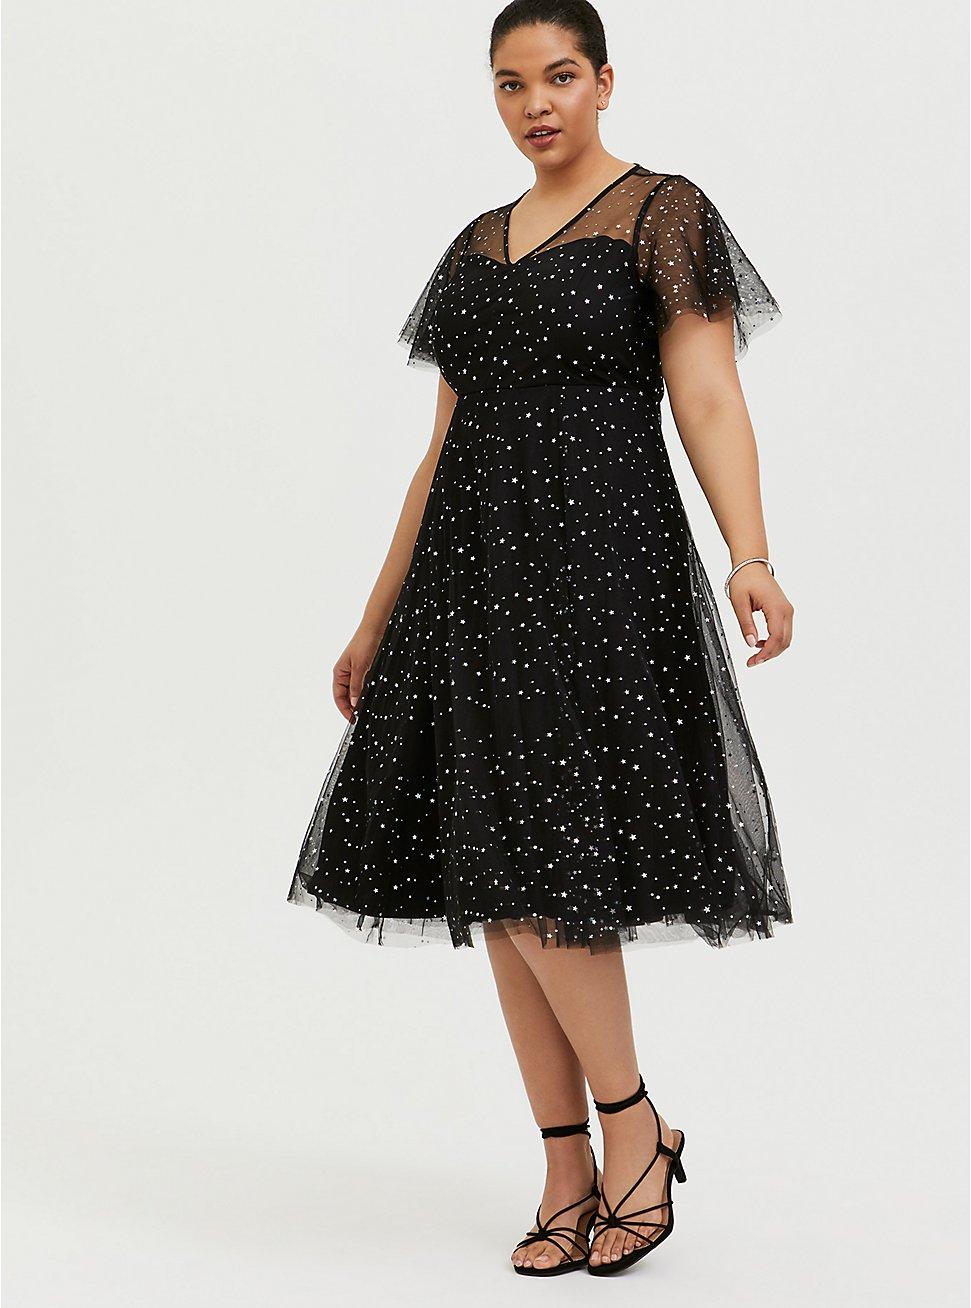 Special Occasion Black Mesh Iridescent Star Midi Dress, DEEP BLACK, hi-res